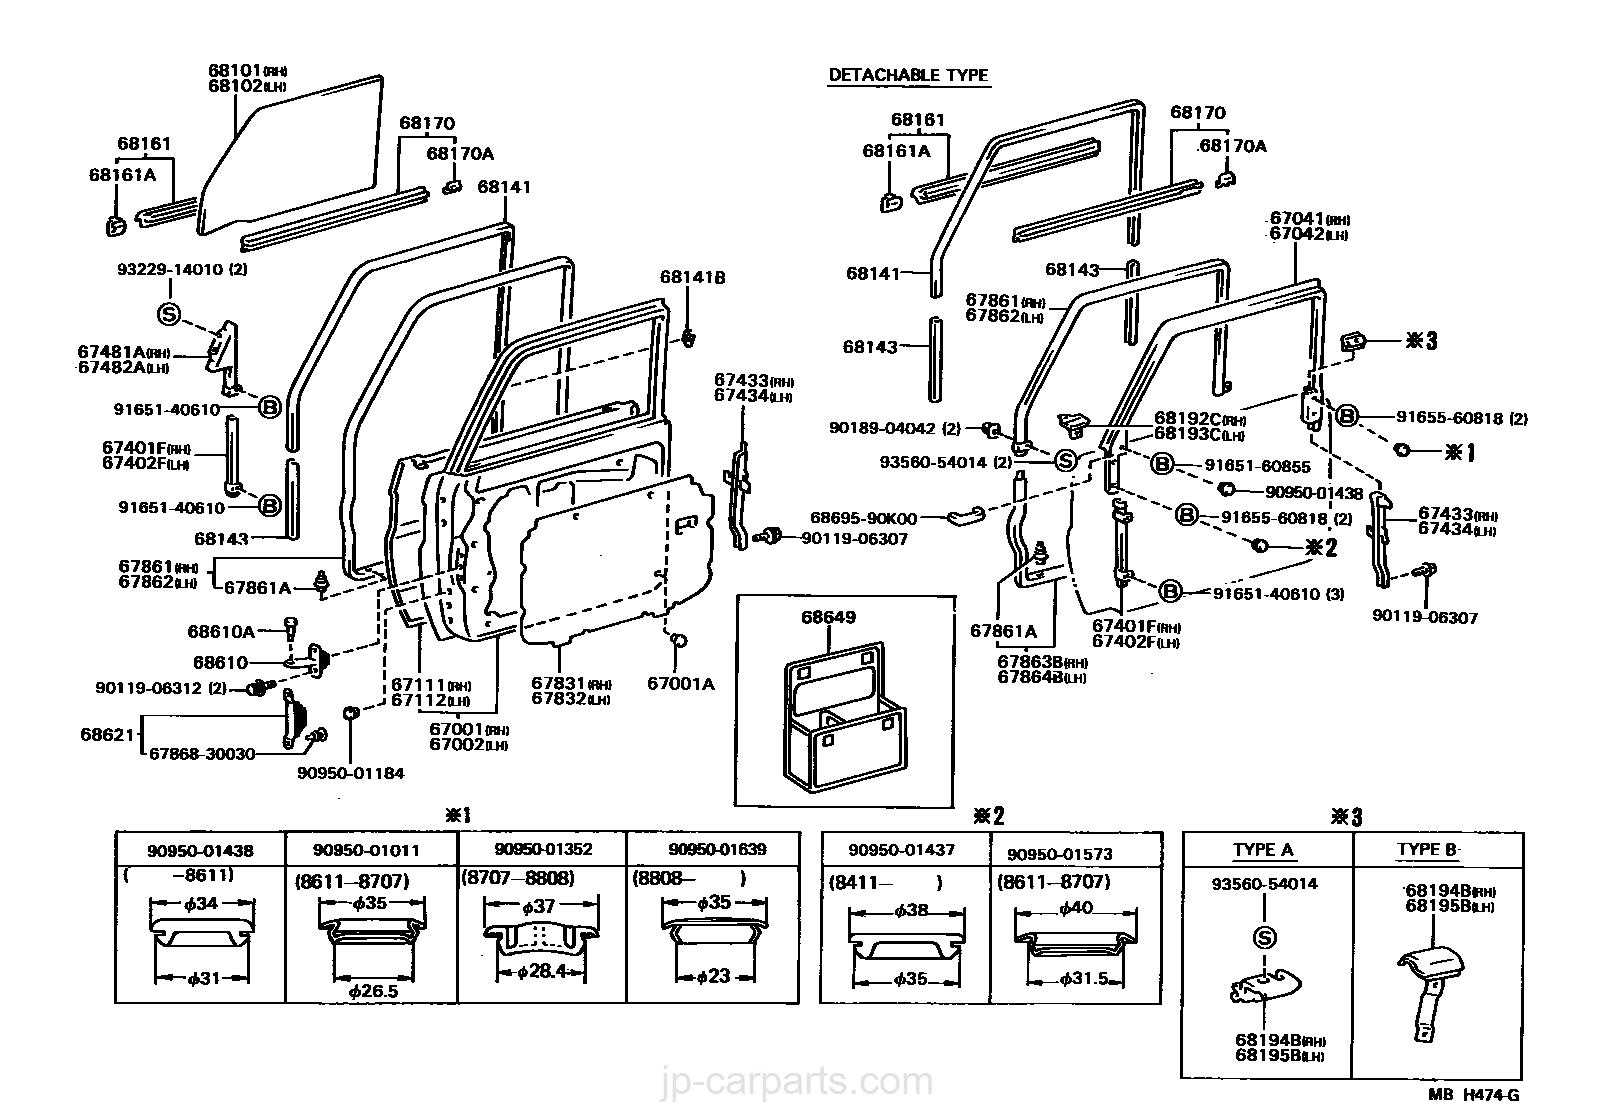 P.T.S Parts 4R OEM New Genuine Nіssаn RH Inside Handle Cap 2013-2019 Раthfіndеr 80676-3TA0B